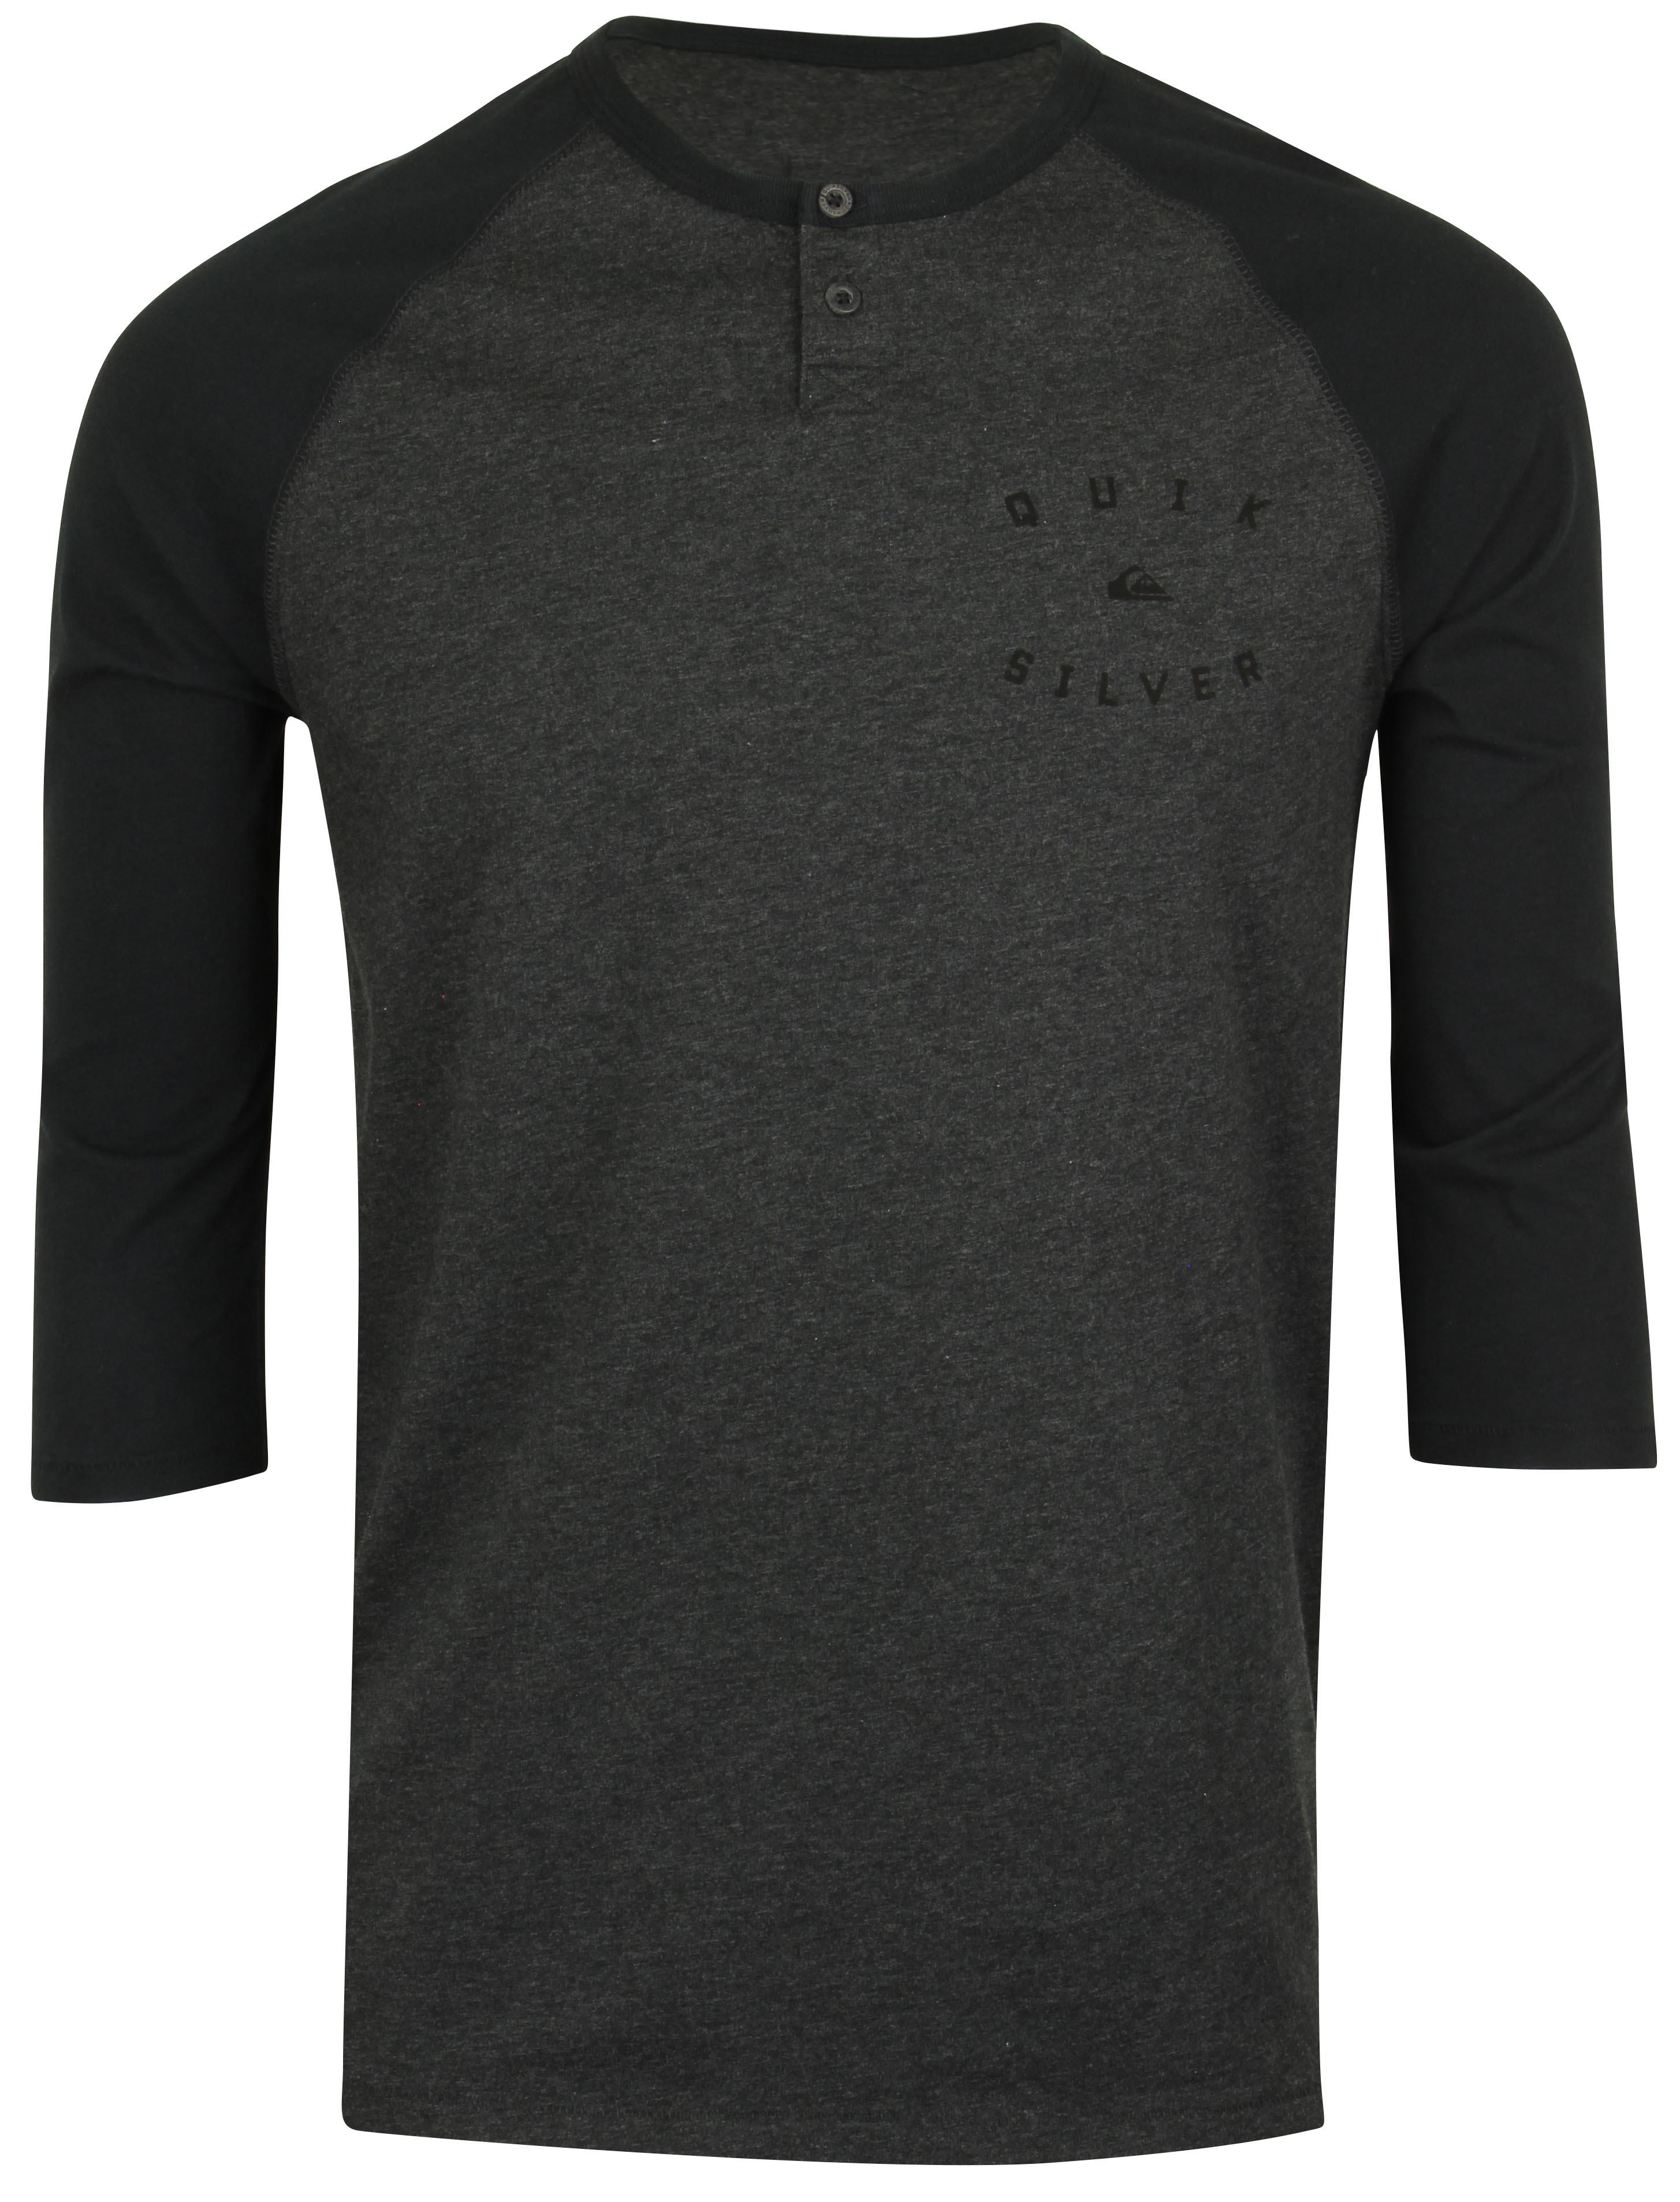 Quiksilver baysic 3 4 sleeve henley shirt dark gray heather for 3 4 henley shirt